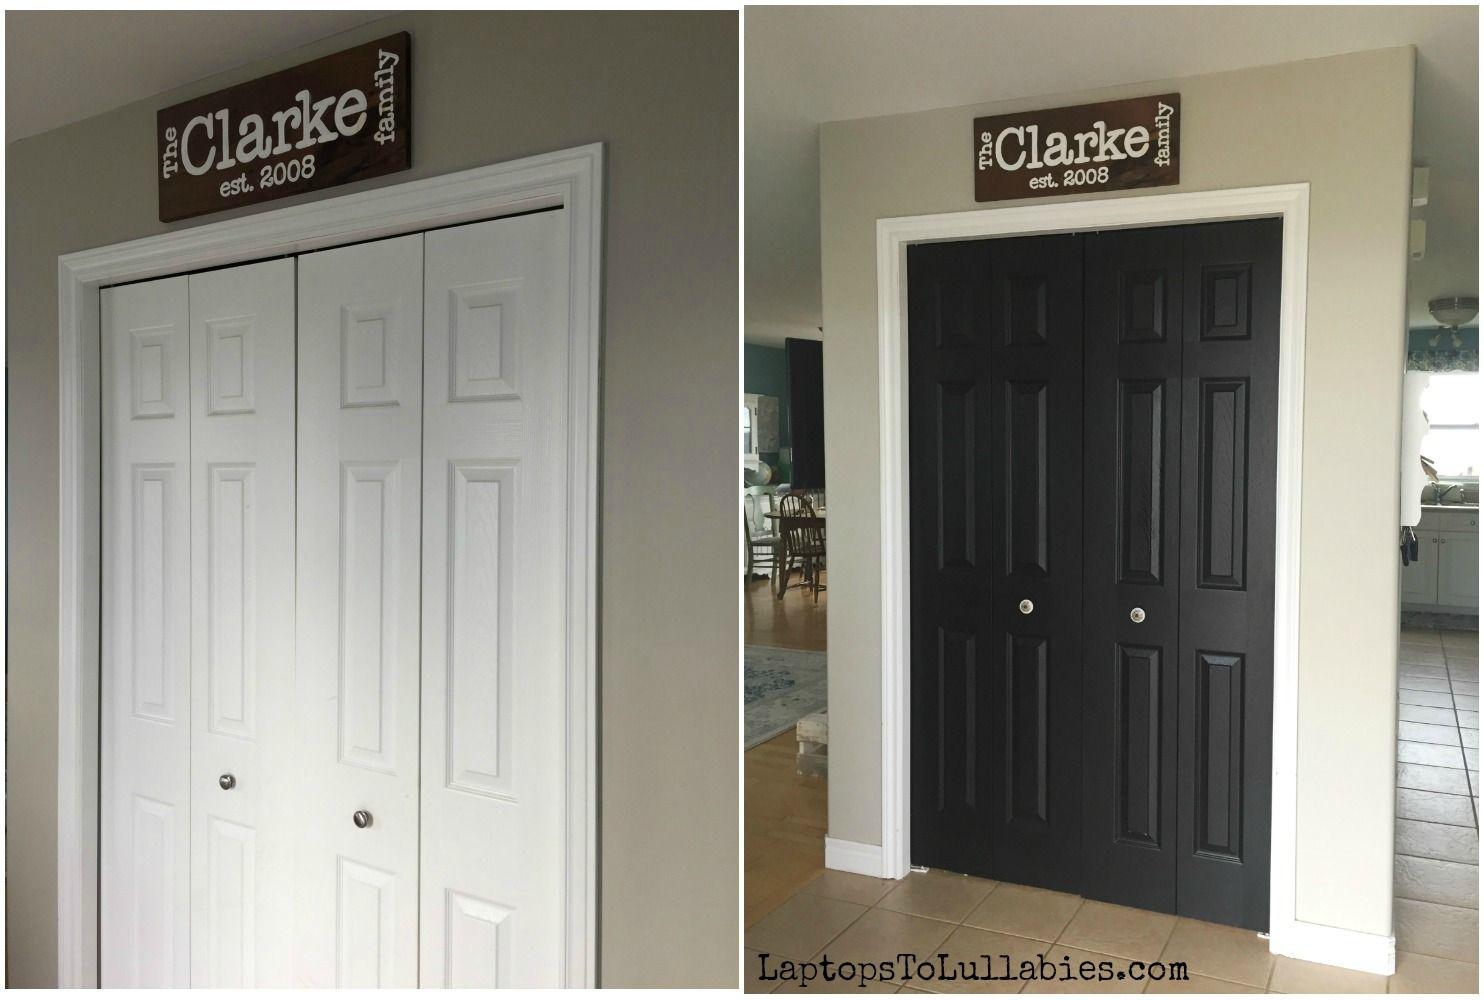 Painting Closet Doors Black Painted Closet Door Diy Projects